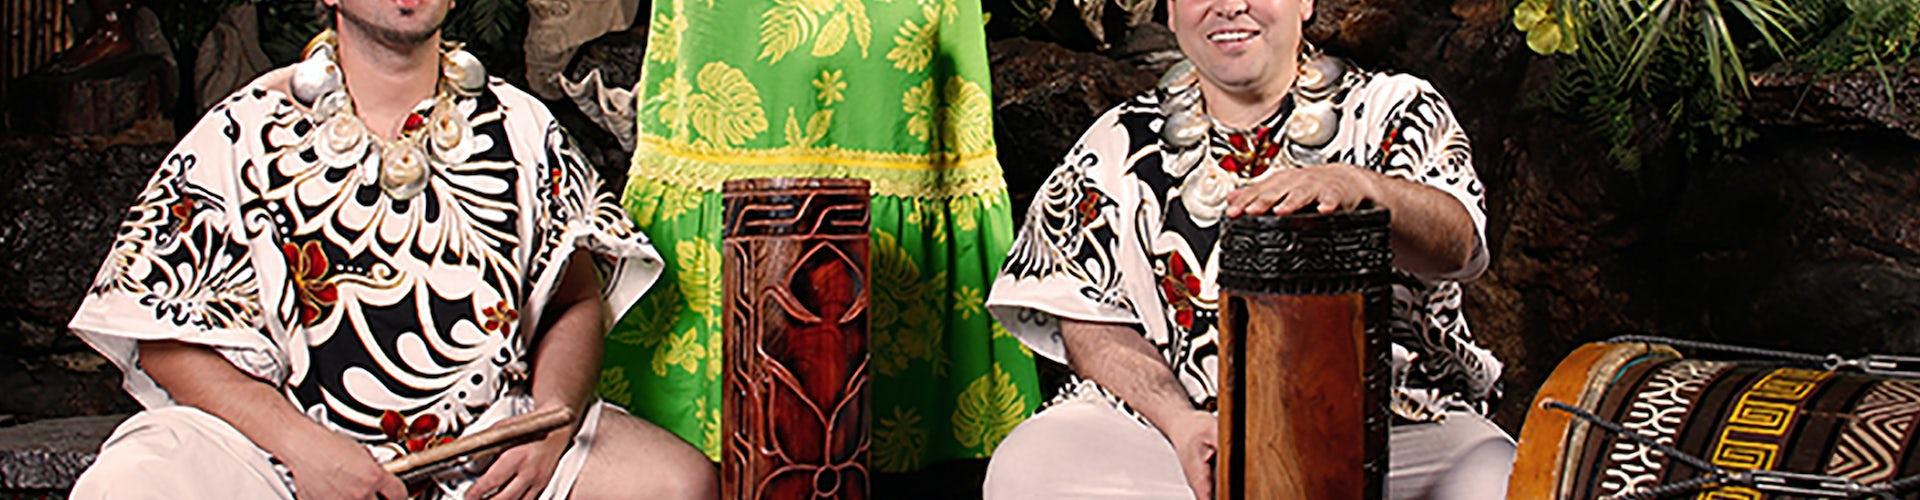 Bali Hai Musicos Chirak Editada